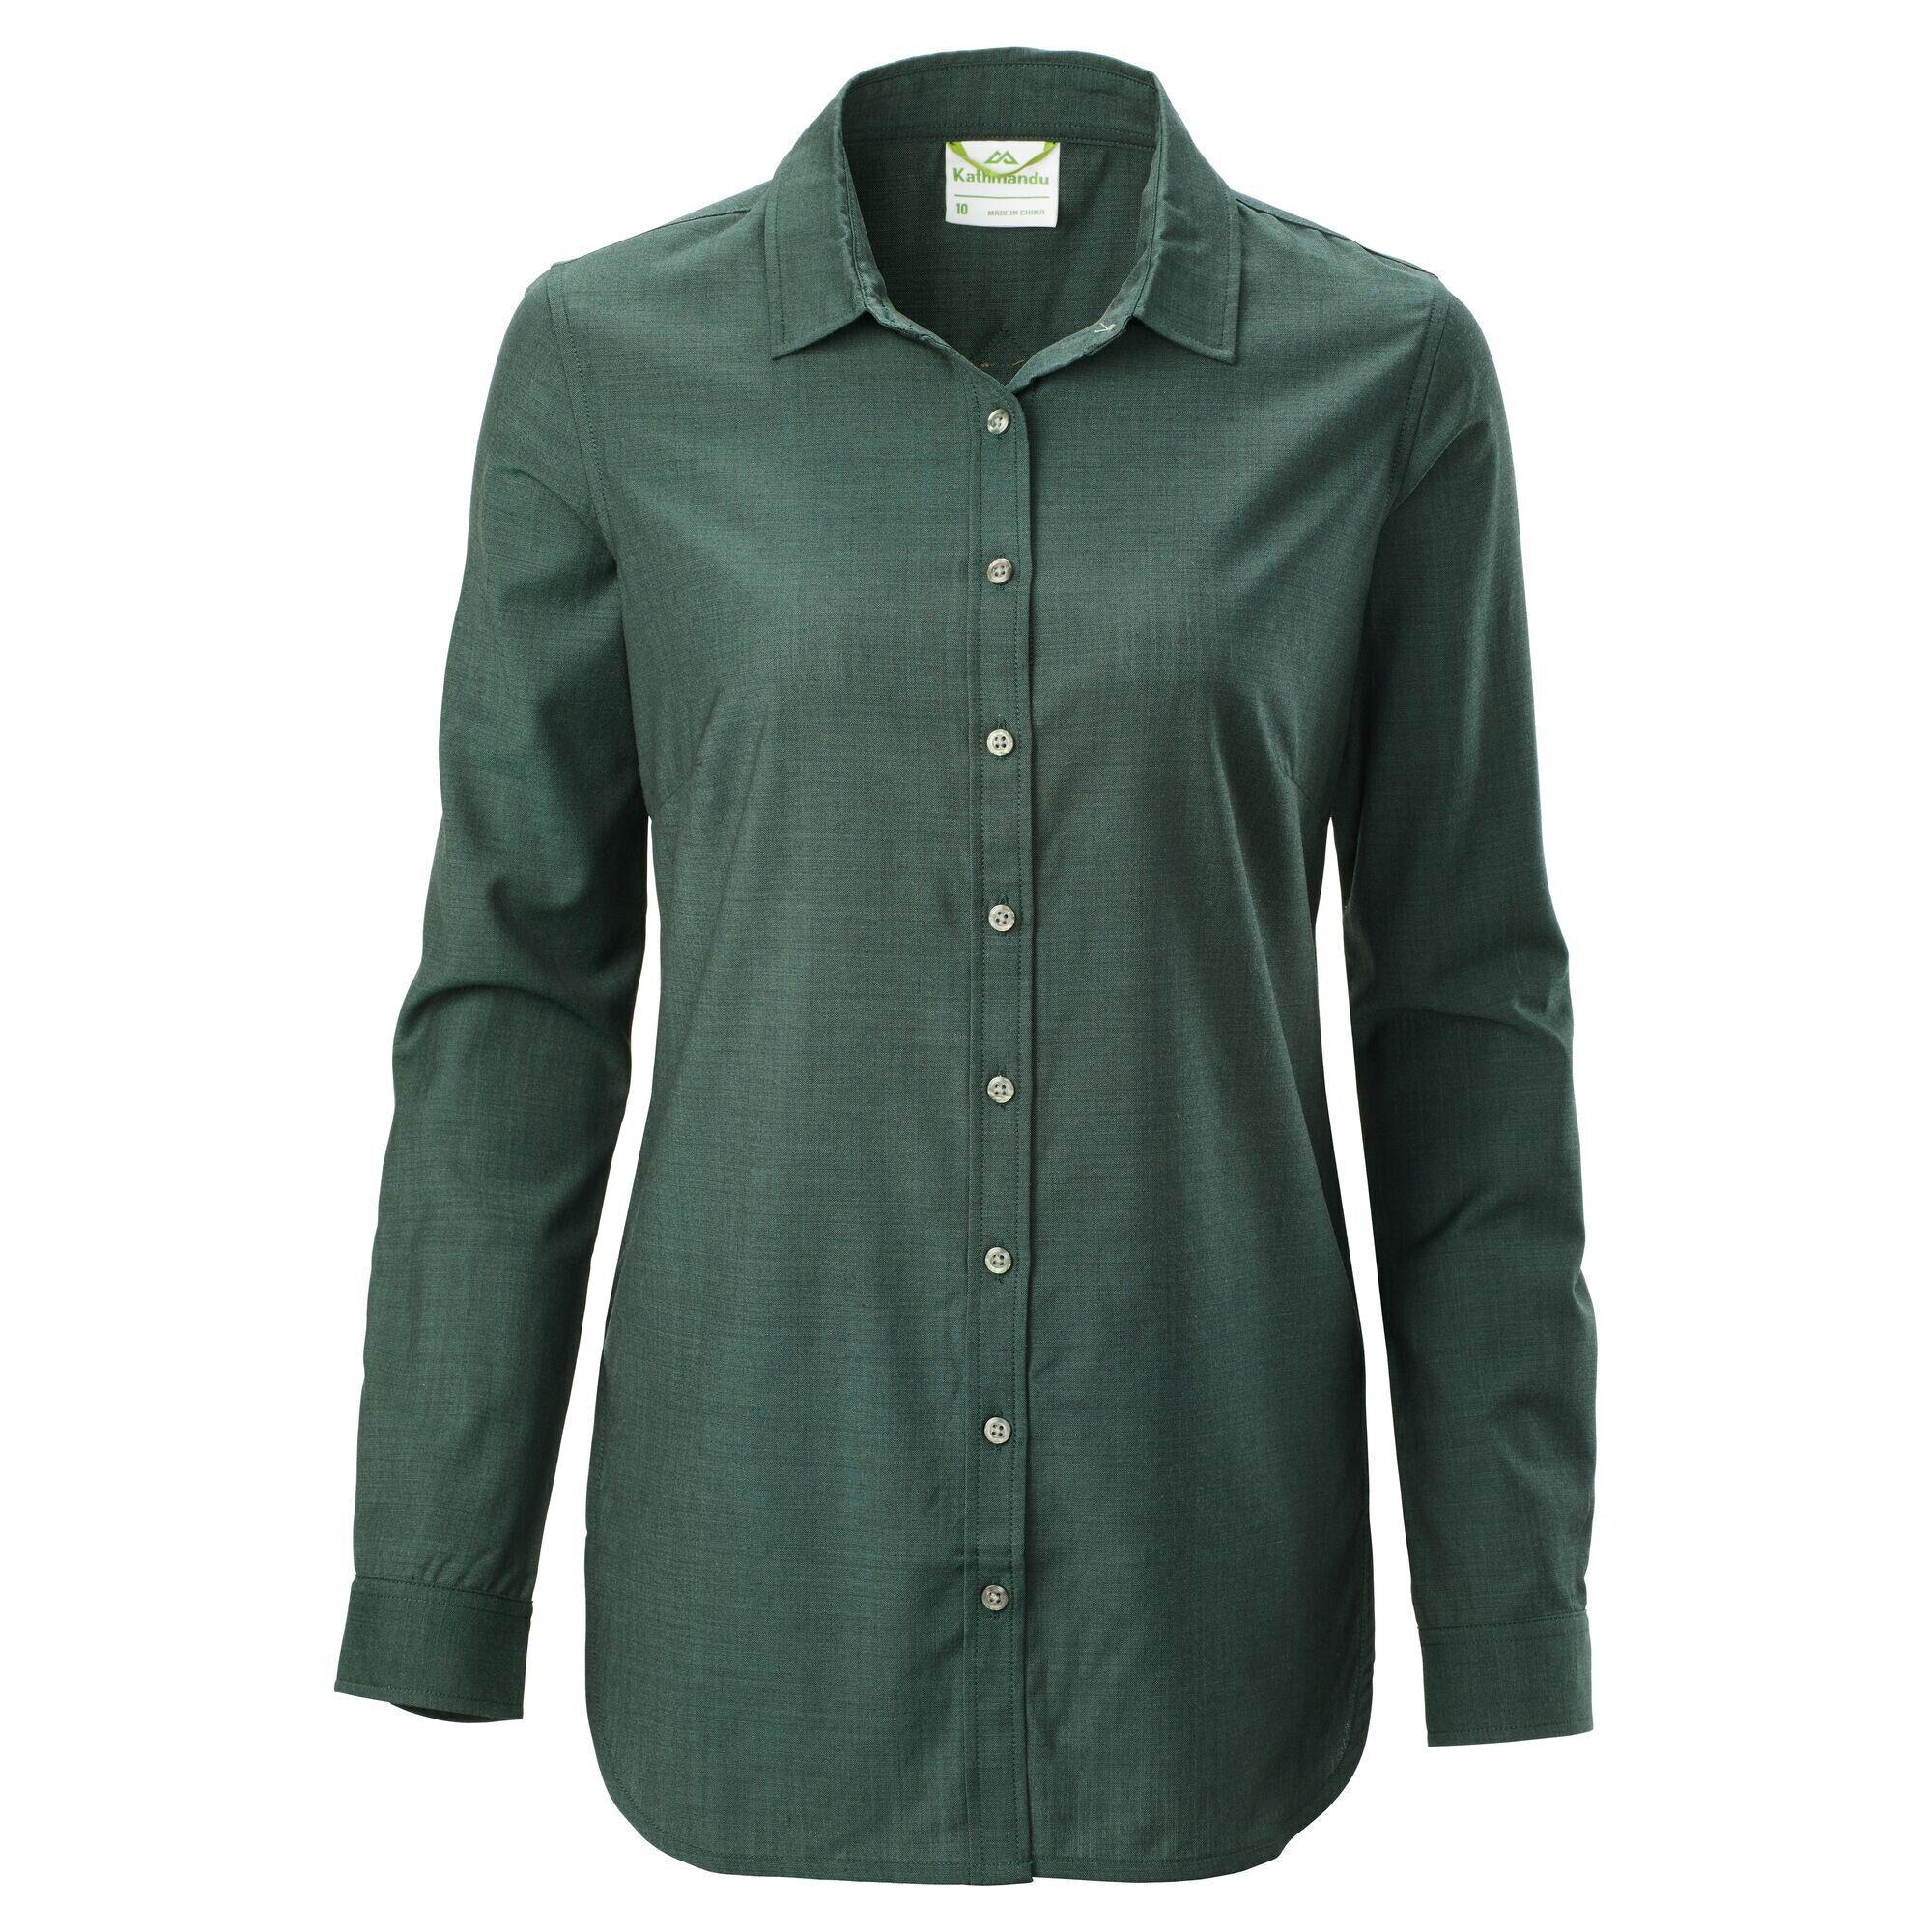 Kathmandu Tomar Women's Merino Long Sleeve Shirt  - Dark Spruce - Size: US 6